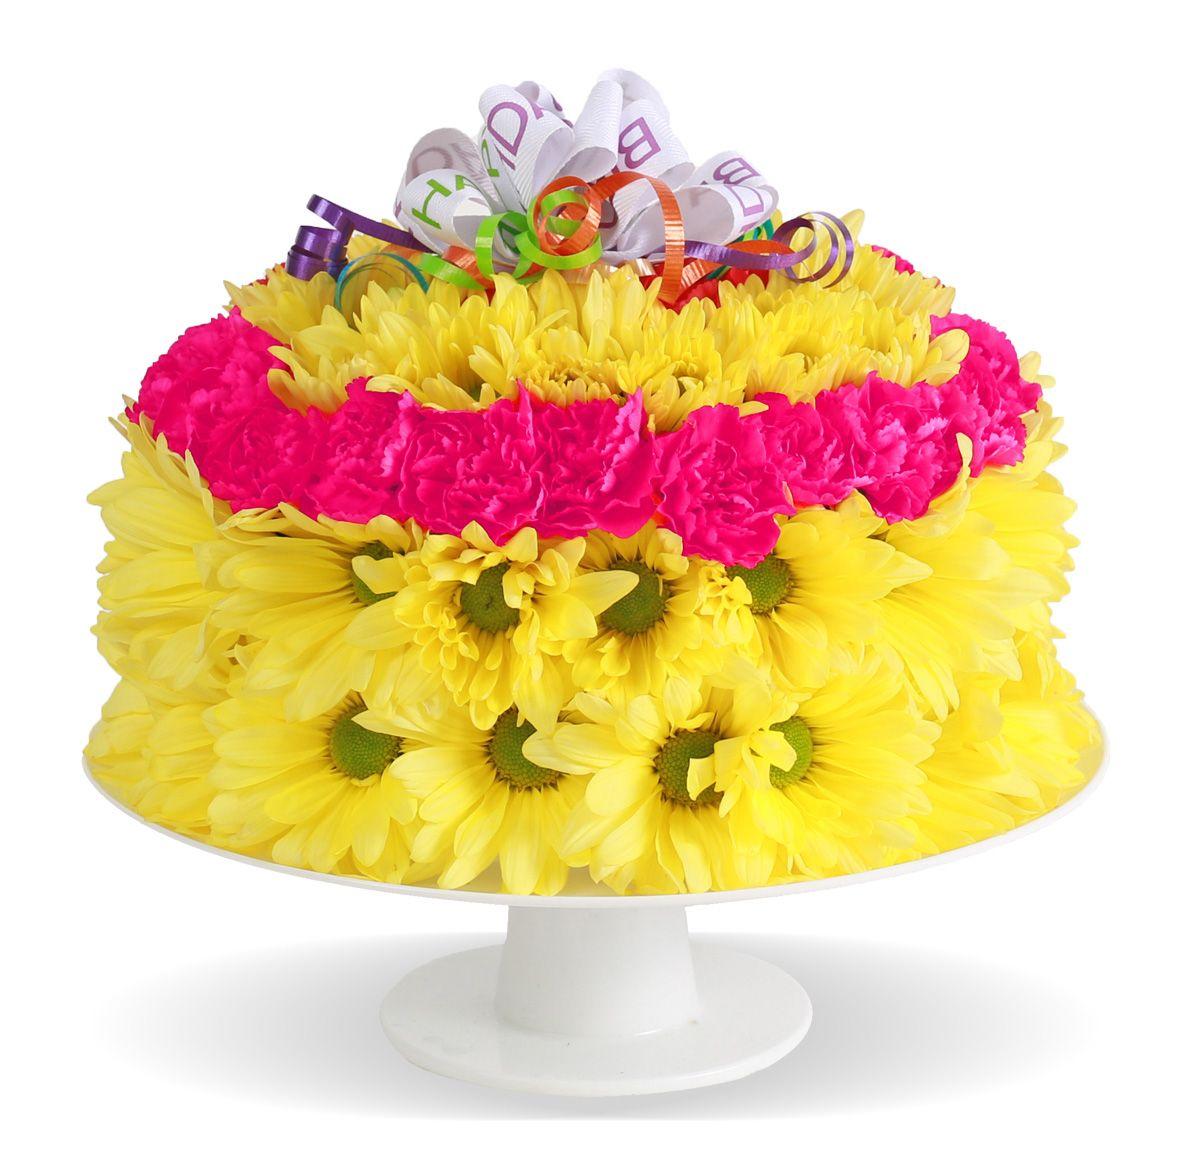 Bestsellers fresh flower birthday cake columbus oh